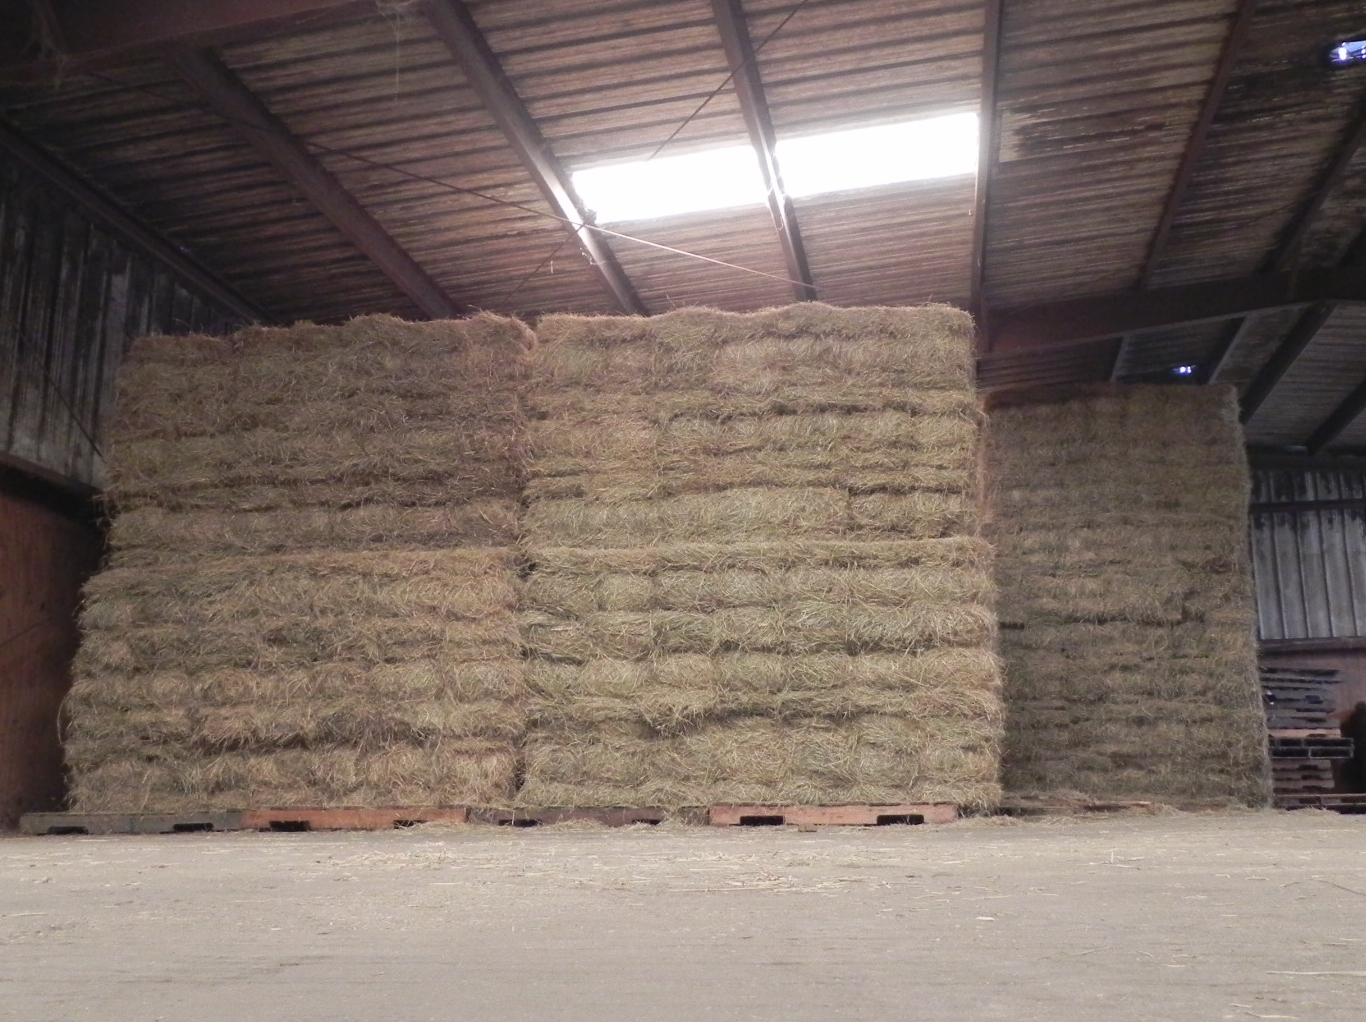 Southeast Texas Hay Supply Steinhauser S